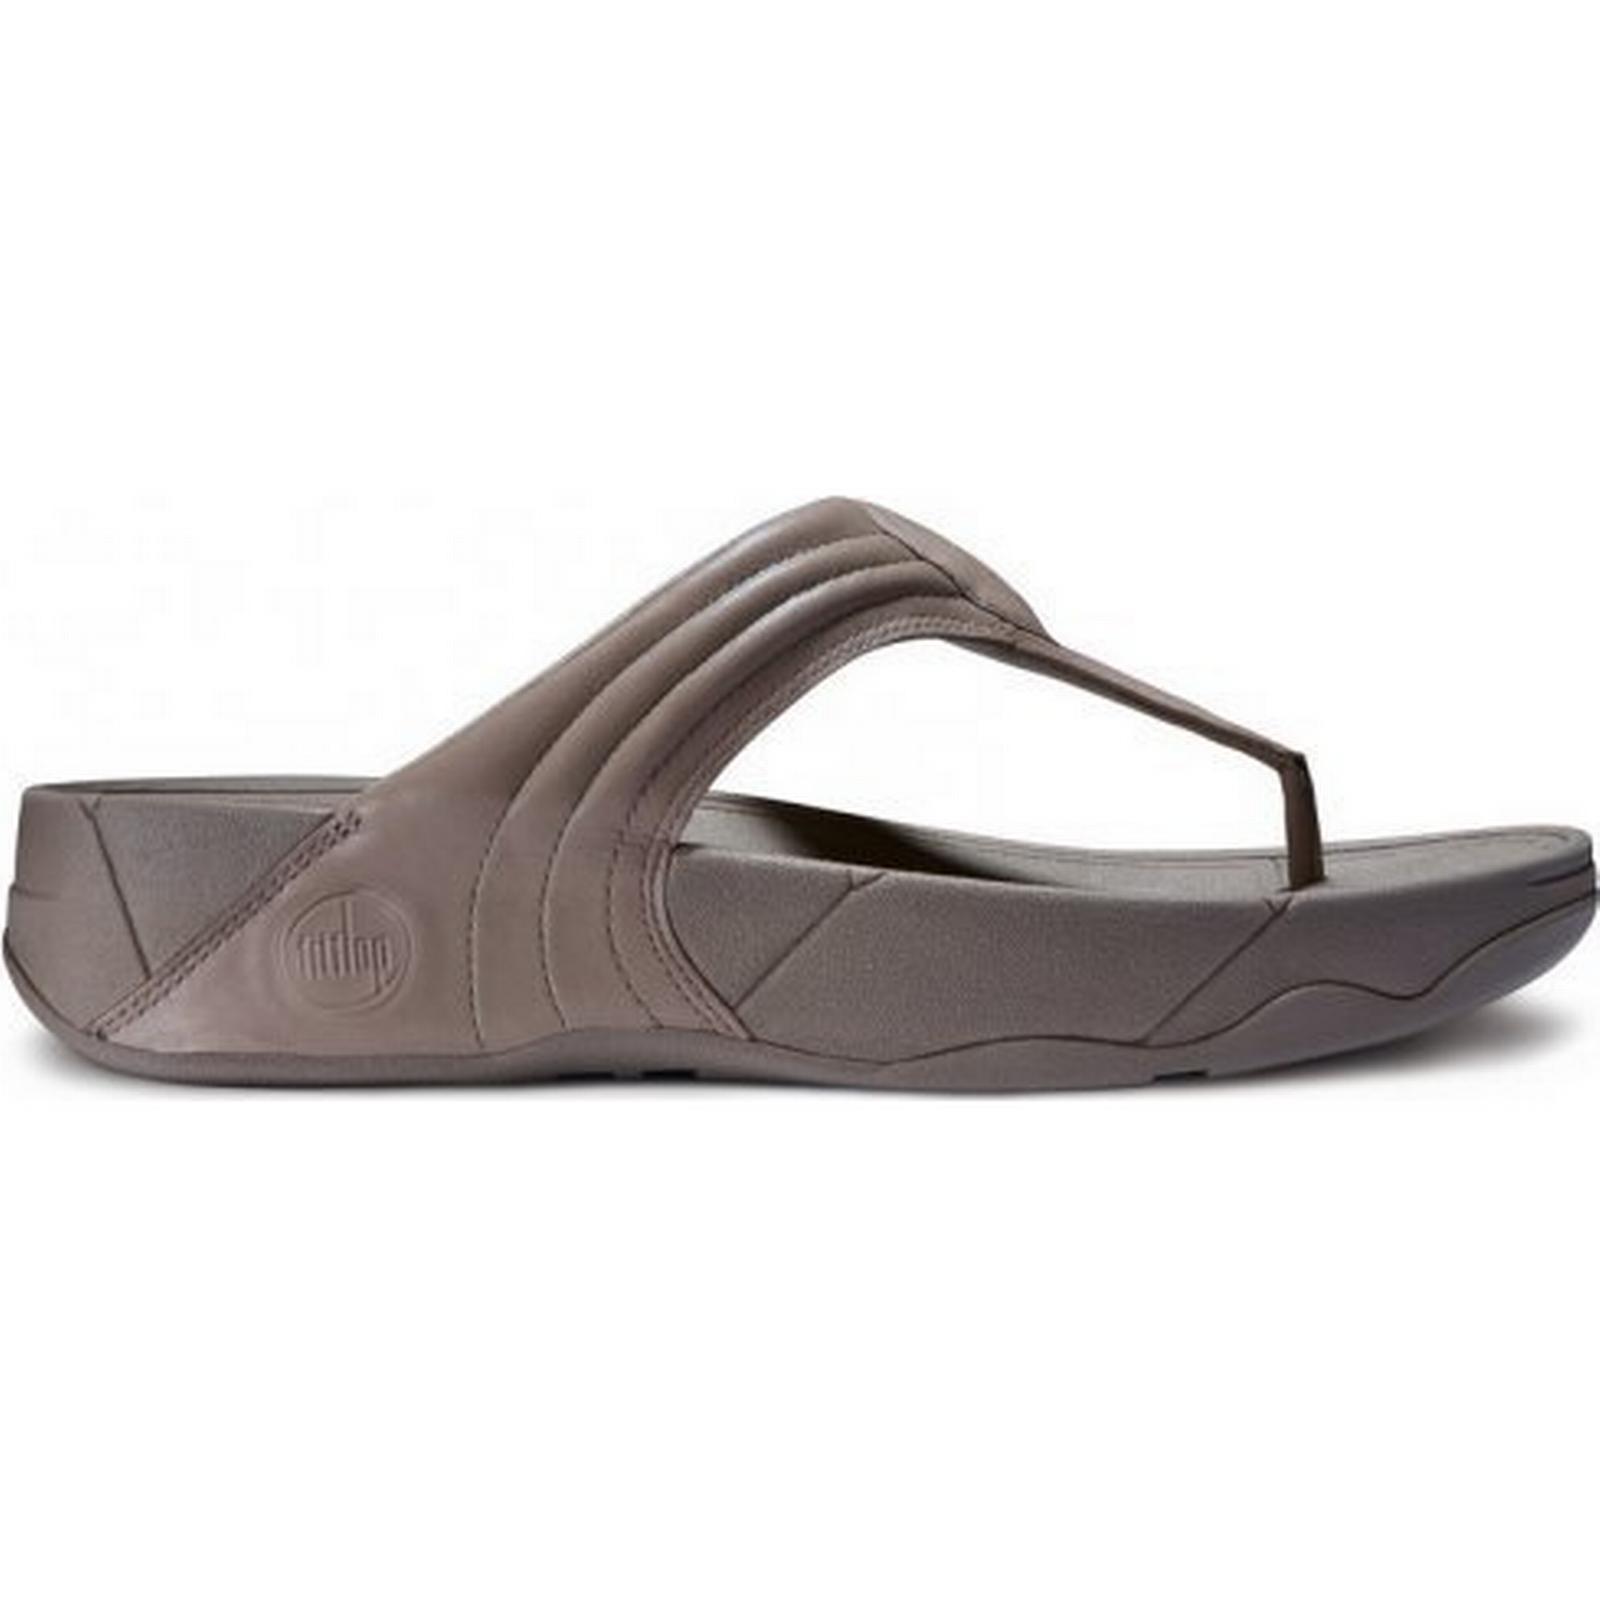 FitFlop Walkstar 3 FitFlop sandal sandal FitFlop in mink Size: 6, Colour: MINK 65f7ee